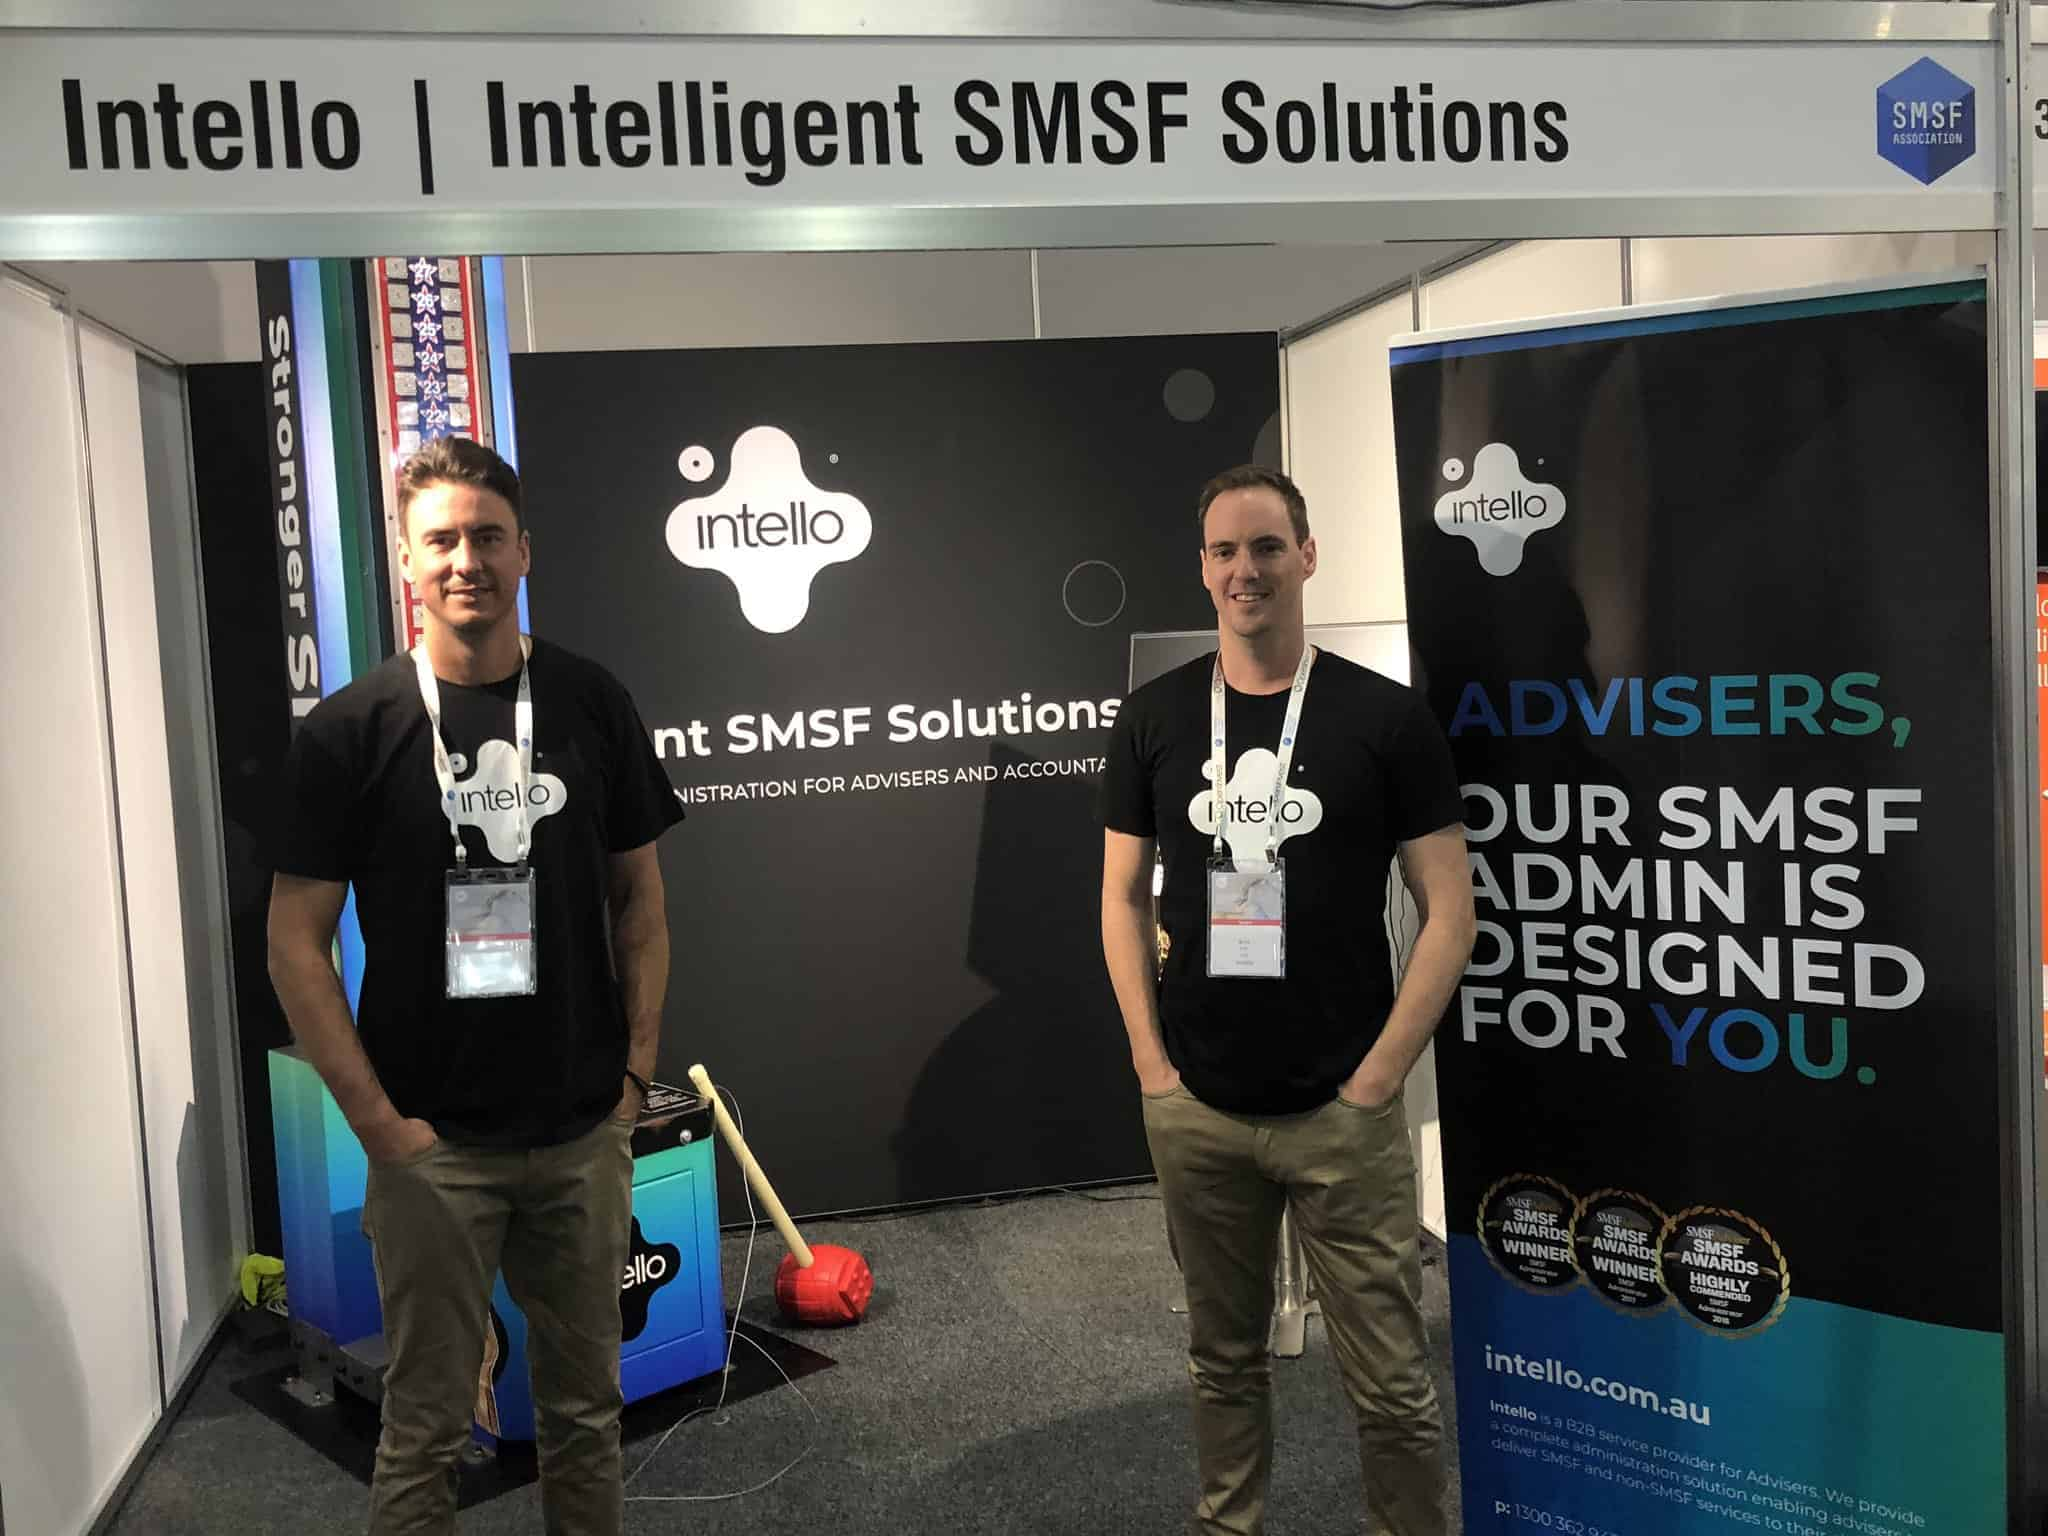 Kris Kitto Jamie Libiets Intello SMSF Conference Gold Coast